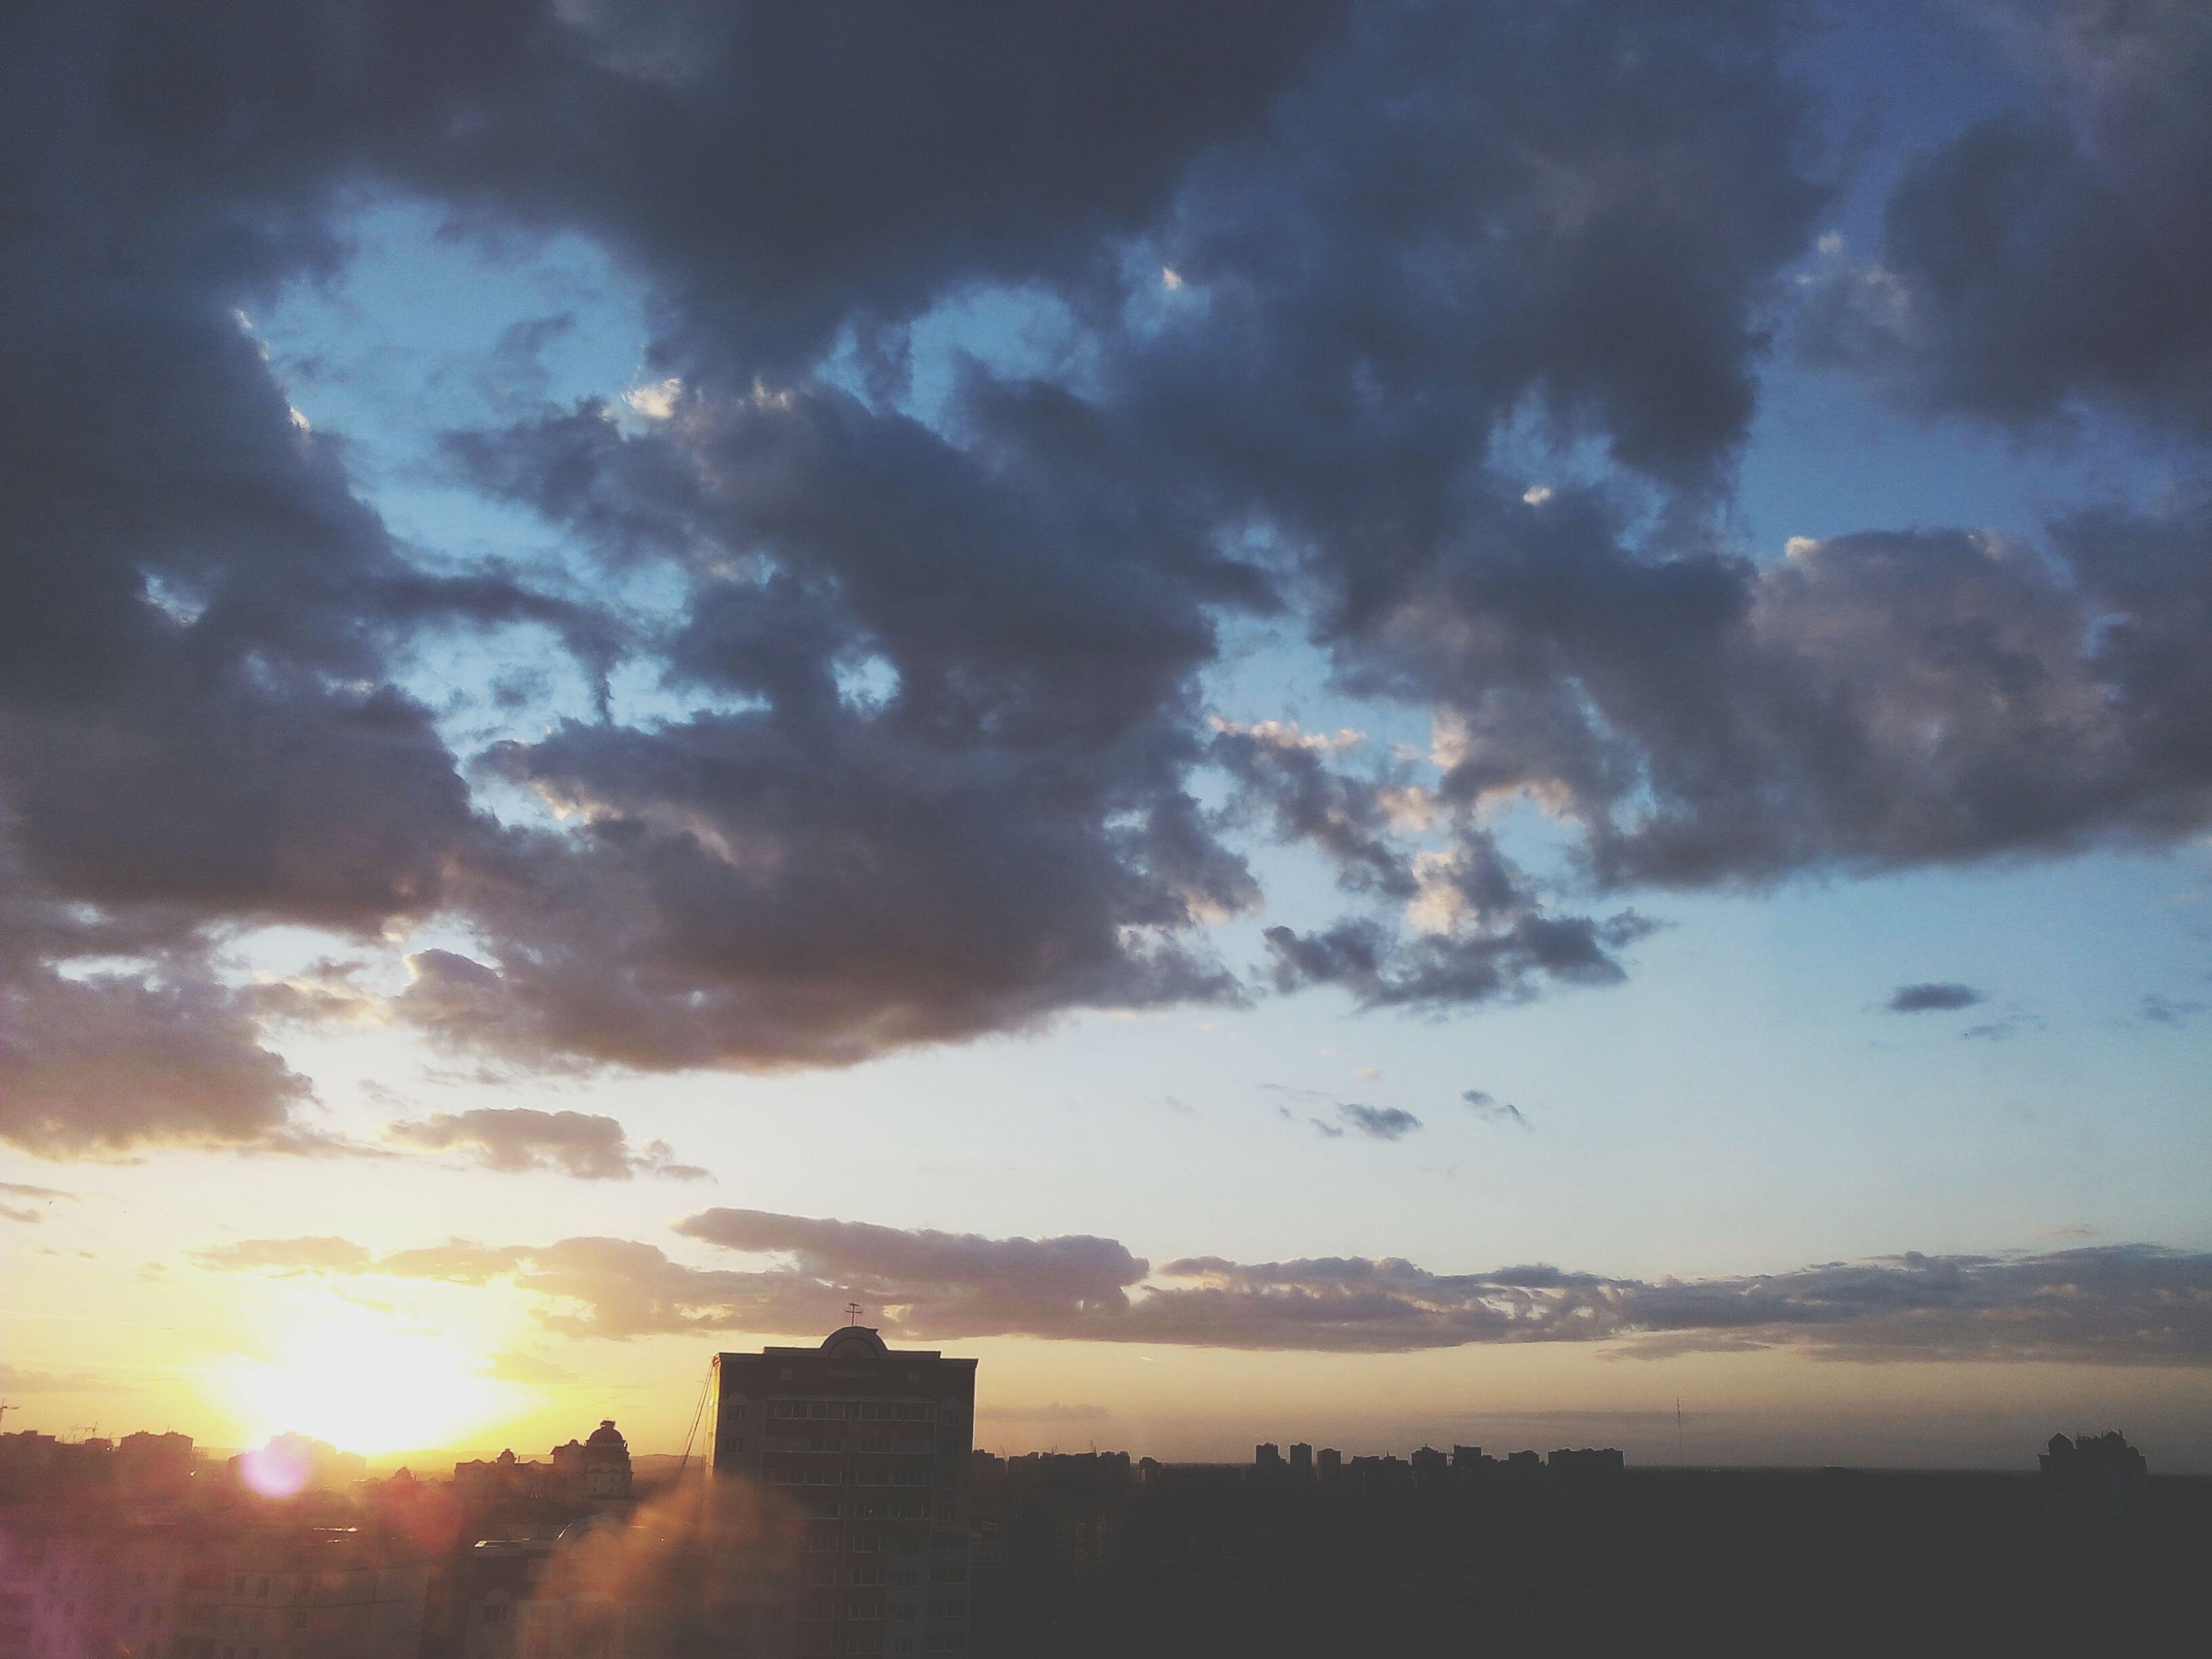 sunset, sky, building exterior, sun, architecture, cloud - sky, silhouette, built structure, sunbeam, sunlight, orange color, cloudy, cloud, city, nature, beauty in nature, building, weather, scenics, low angle view